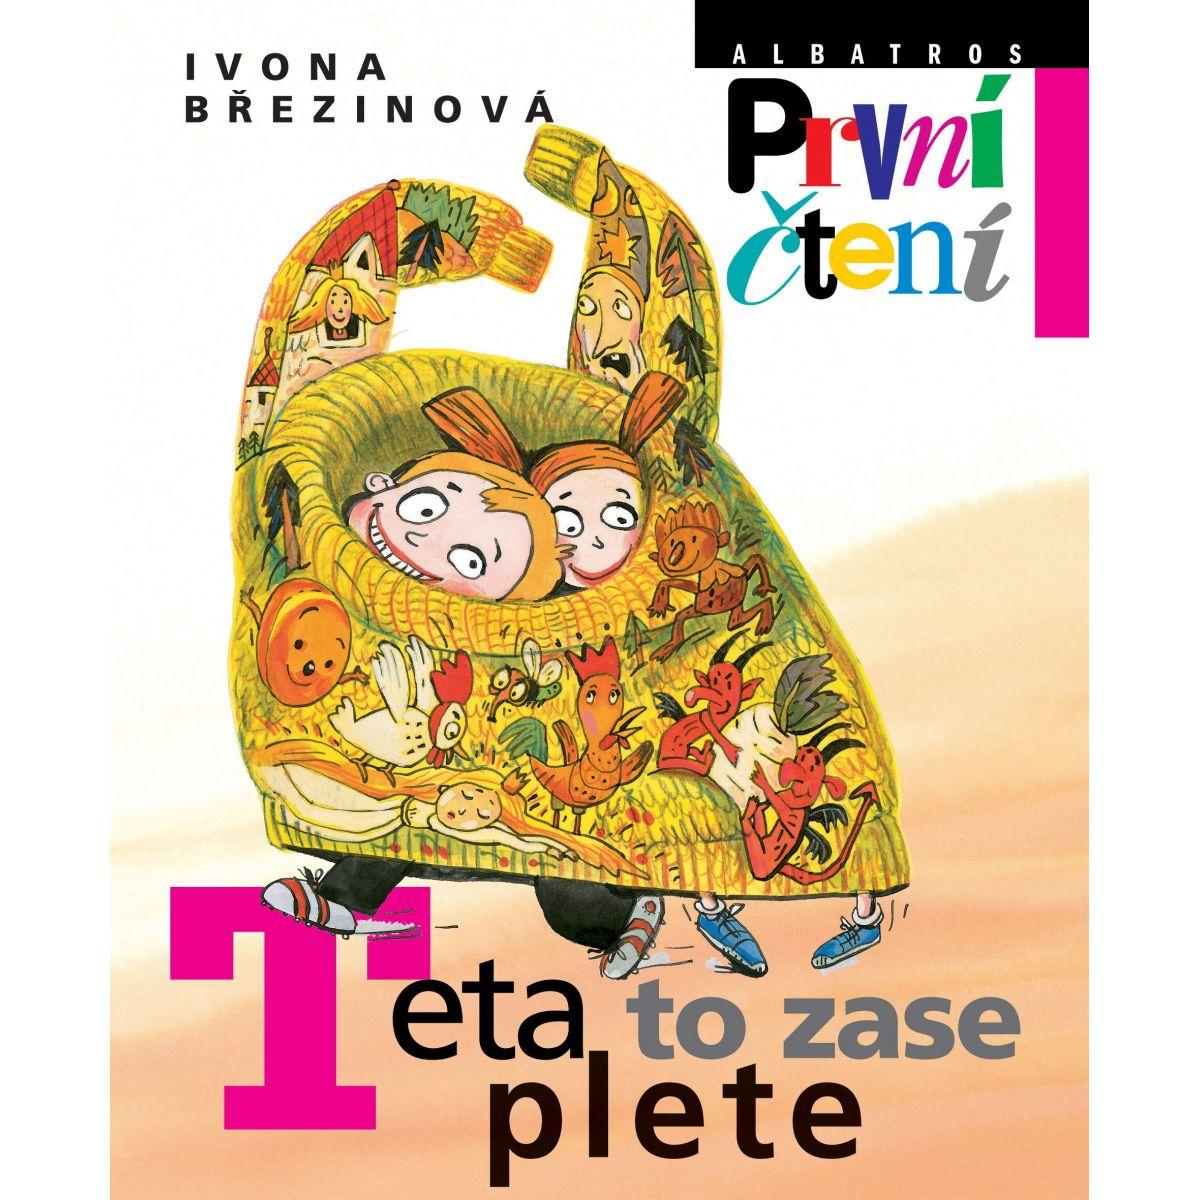 Teta to zase plete Ivona Březinová